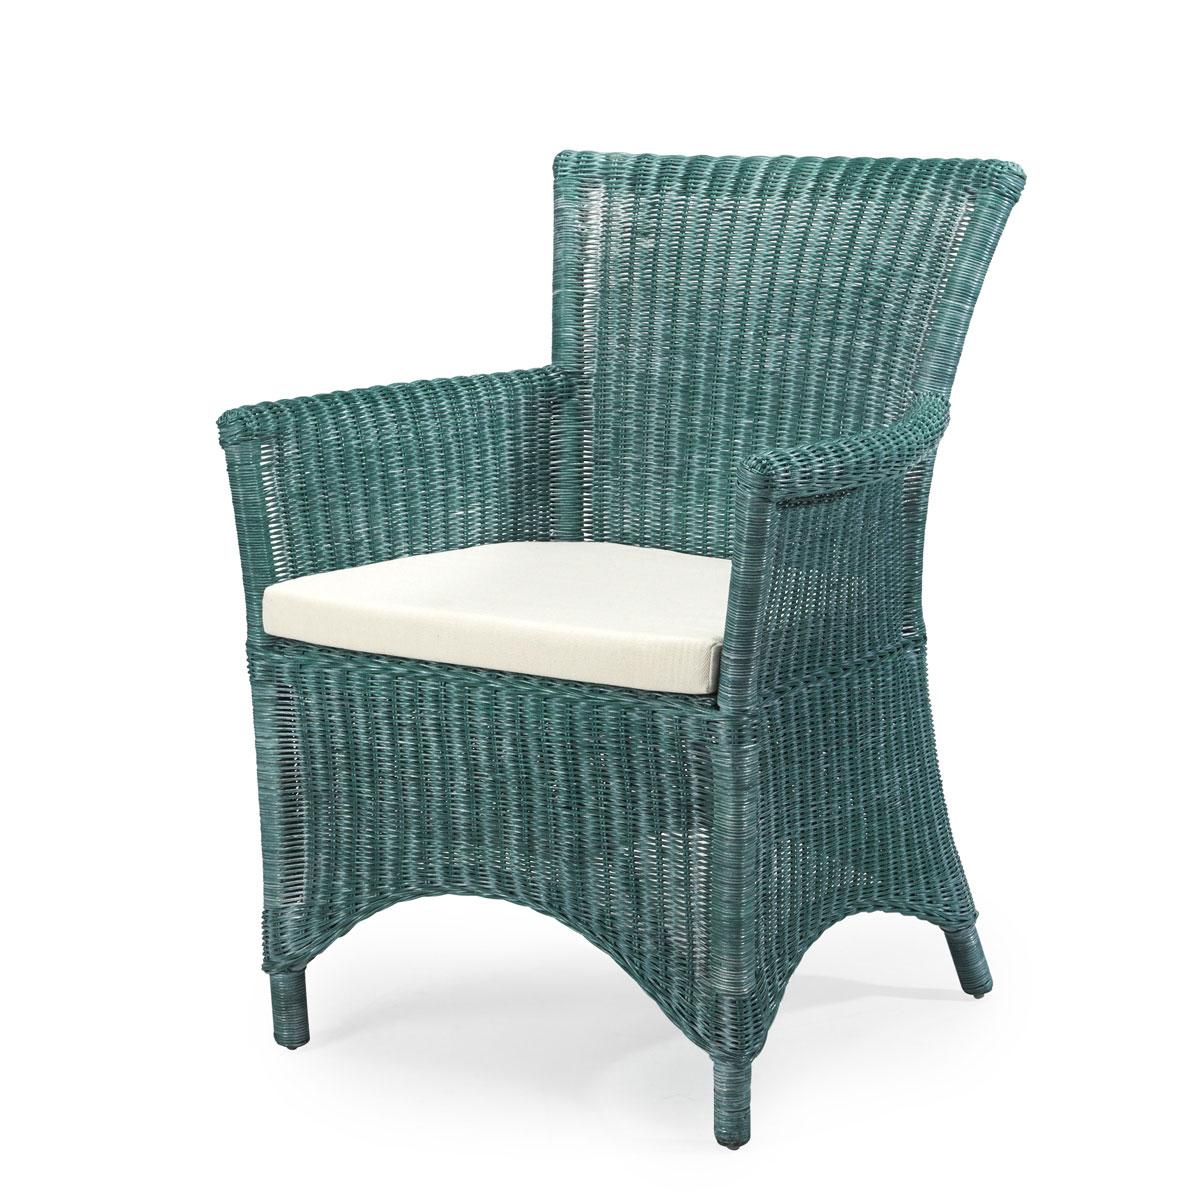 : Lot 6 Fauteuils en Rotin Vert ROSAS fauteuil salle à manger